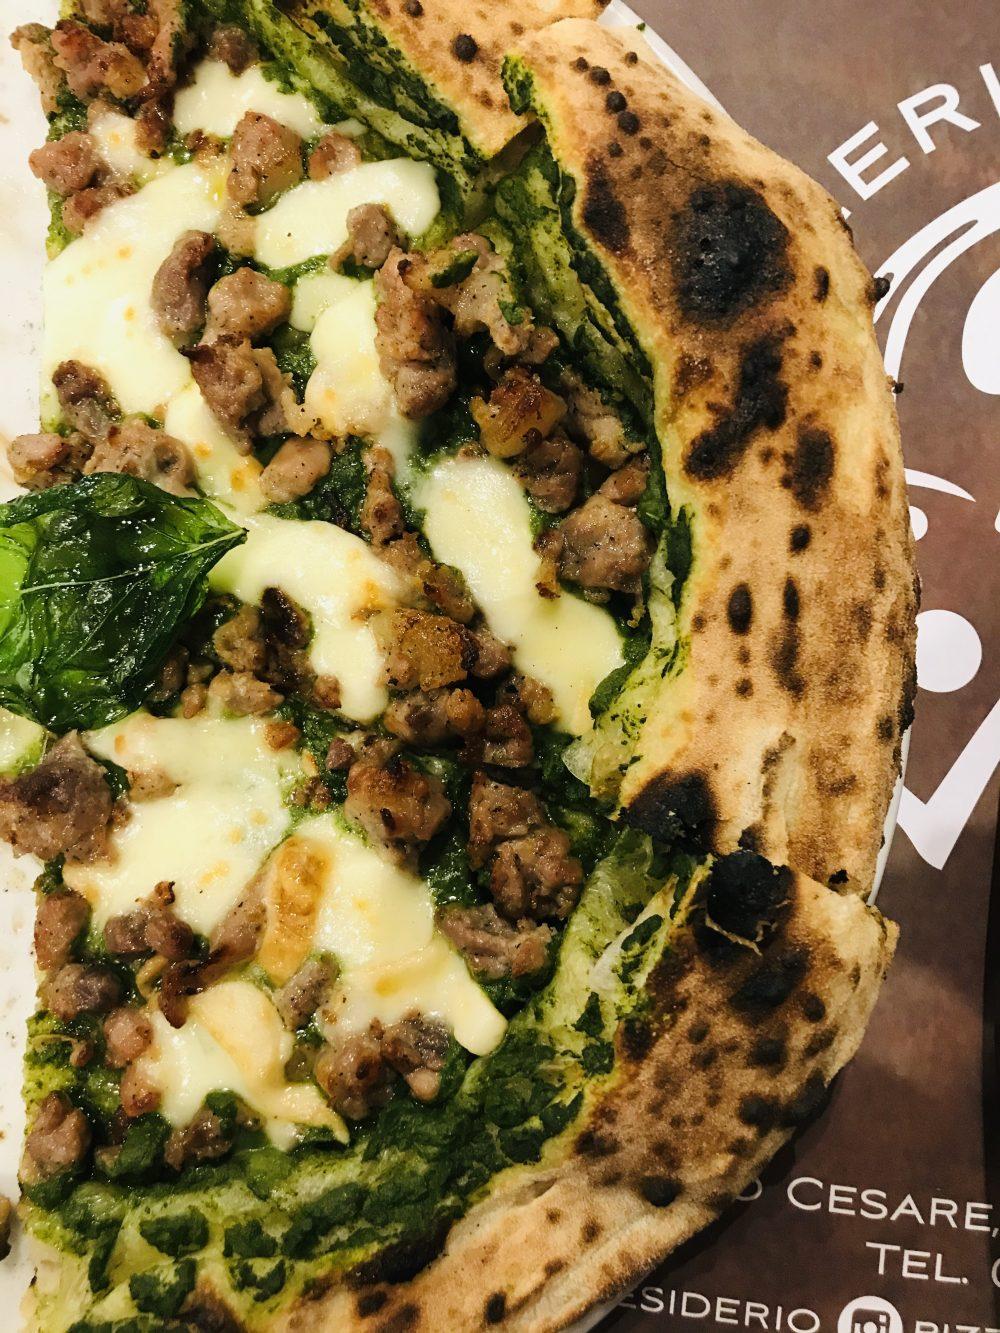 Pizzeria Desiderio - pizza Terra Mia